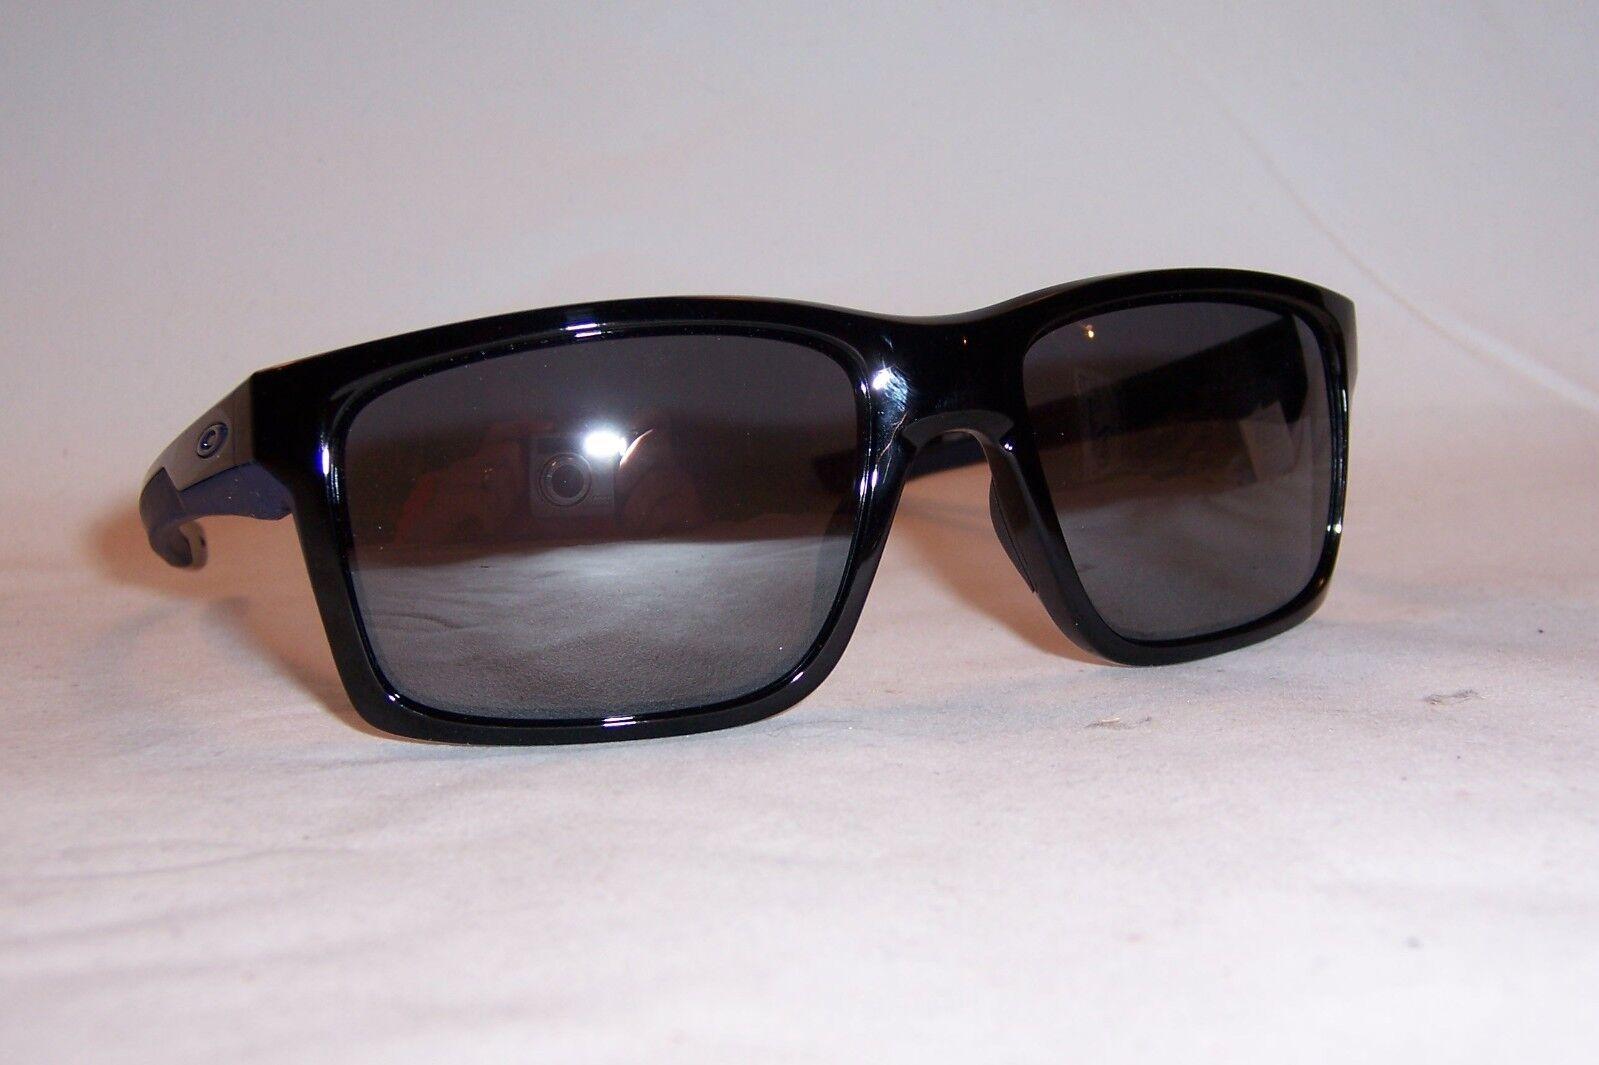 688cff4948 100 Authentic Oakley Mainlink Sunglasses 9264-18 Polished Black